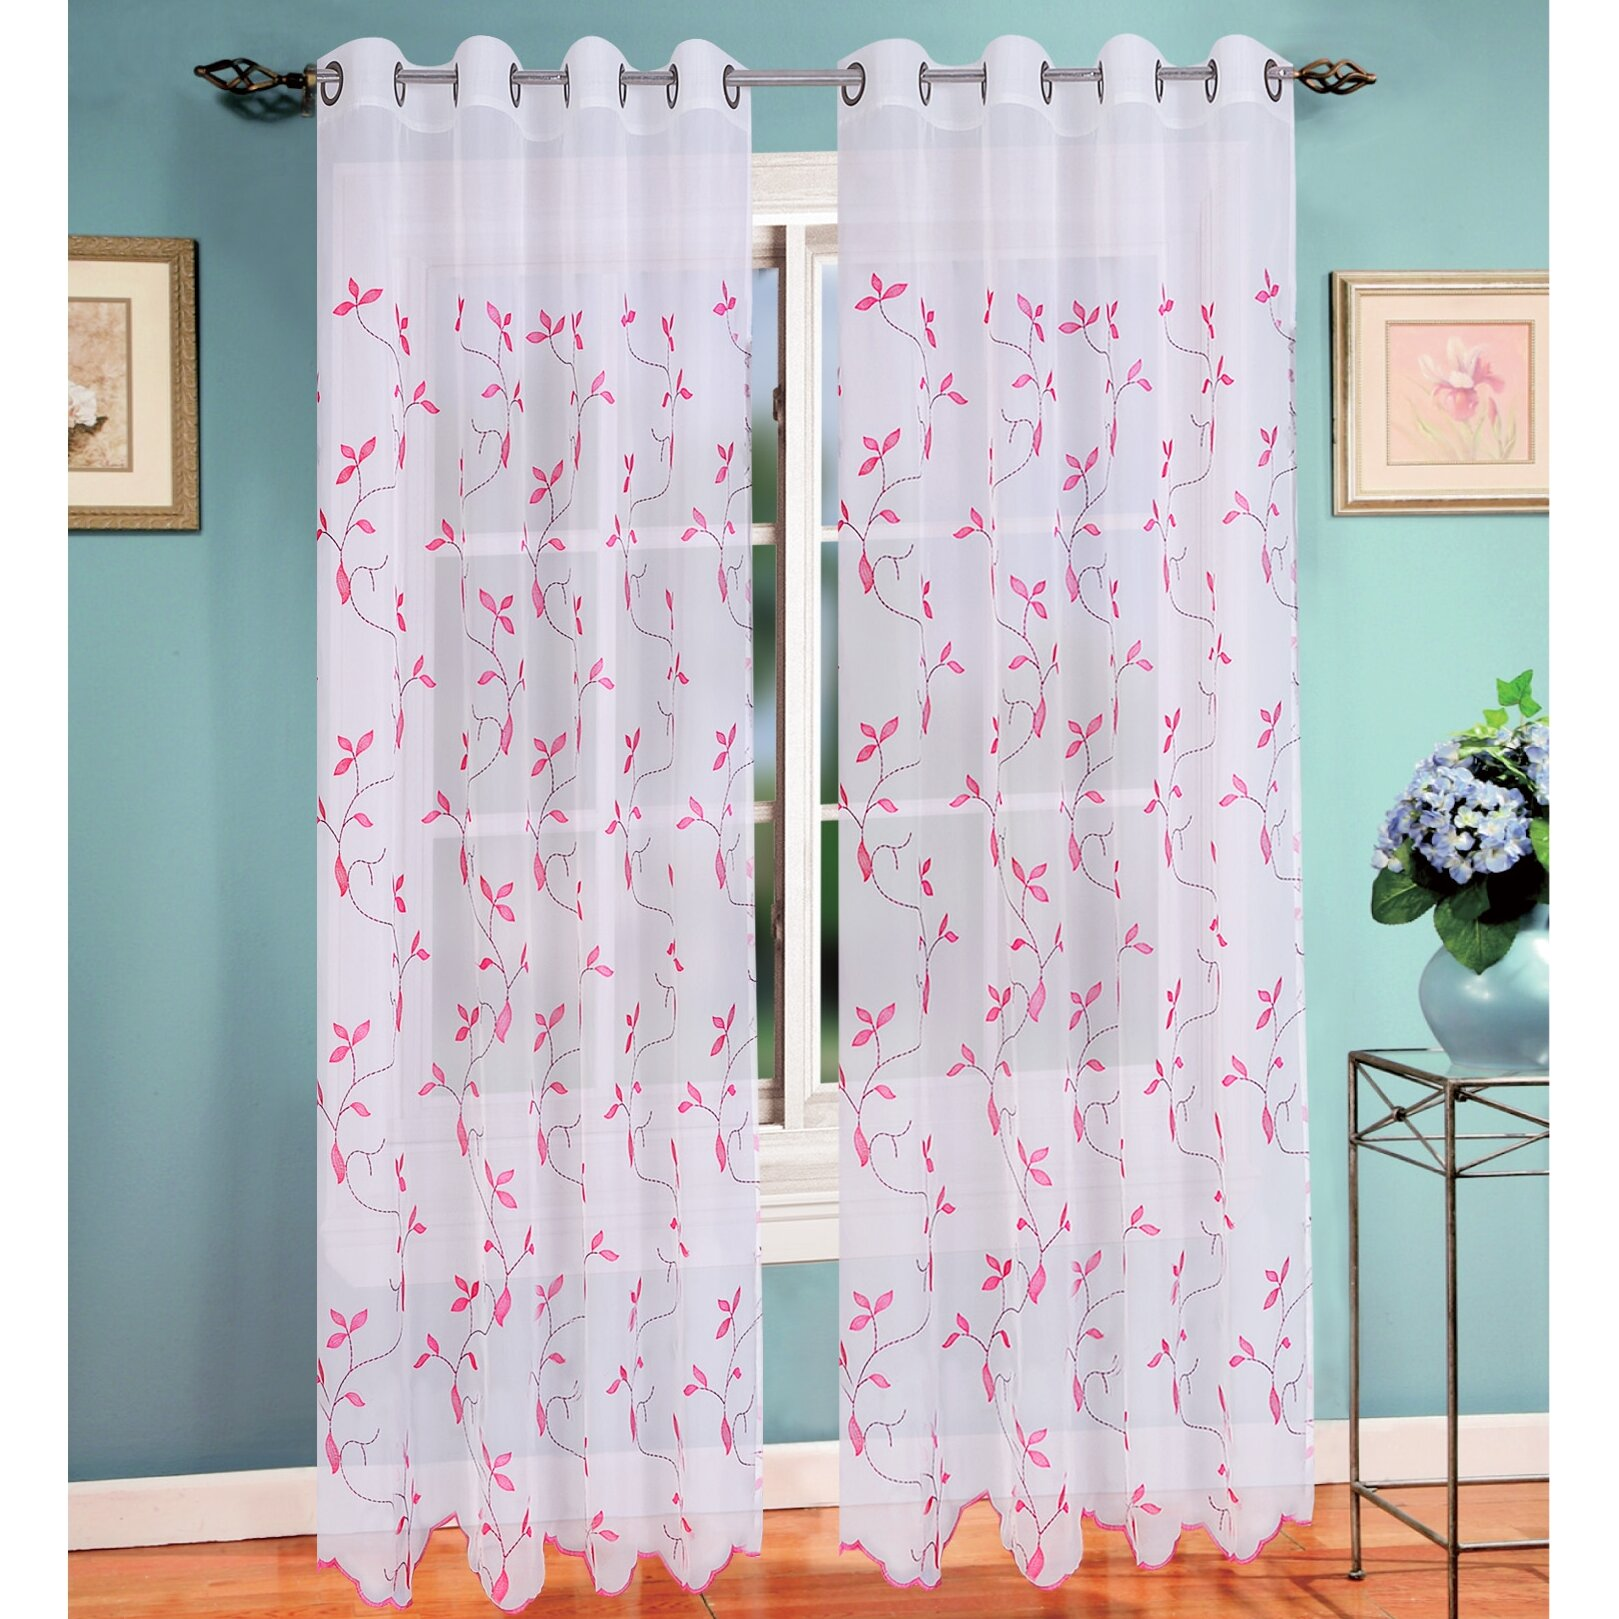 Floral Sheer Grommet Single Curtain Panel